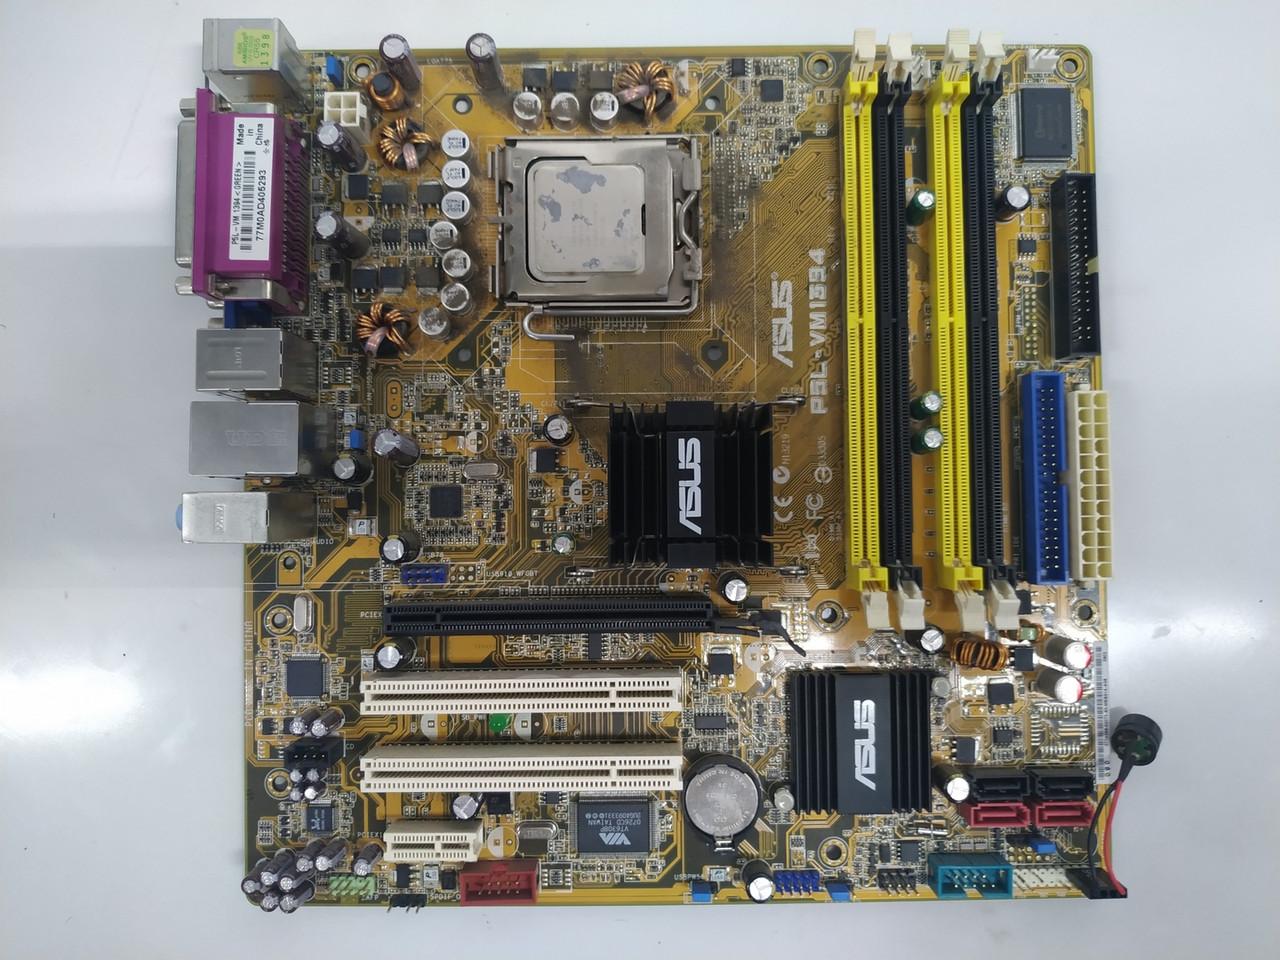 Материнская плата Asus P5L-VM394 (LGA 775, Intel 945P / ICH7, DDR2 4X)